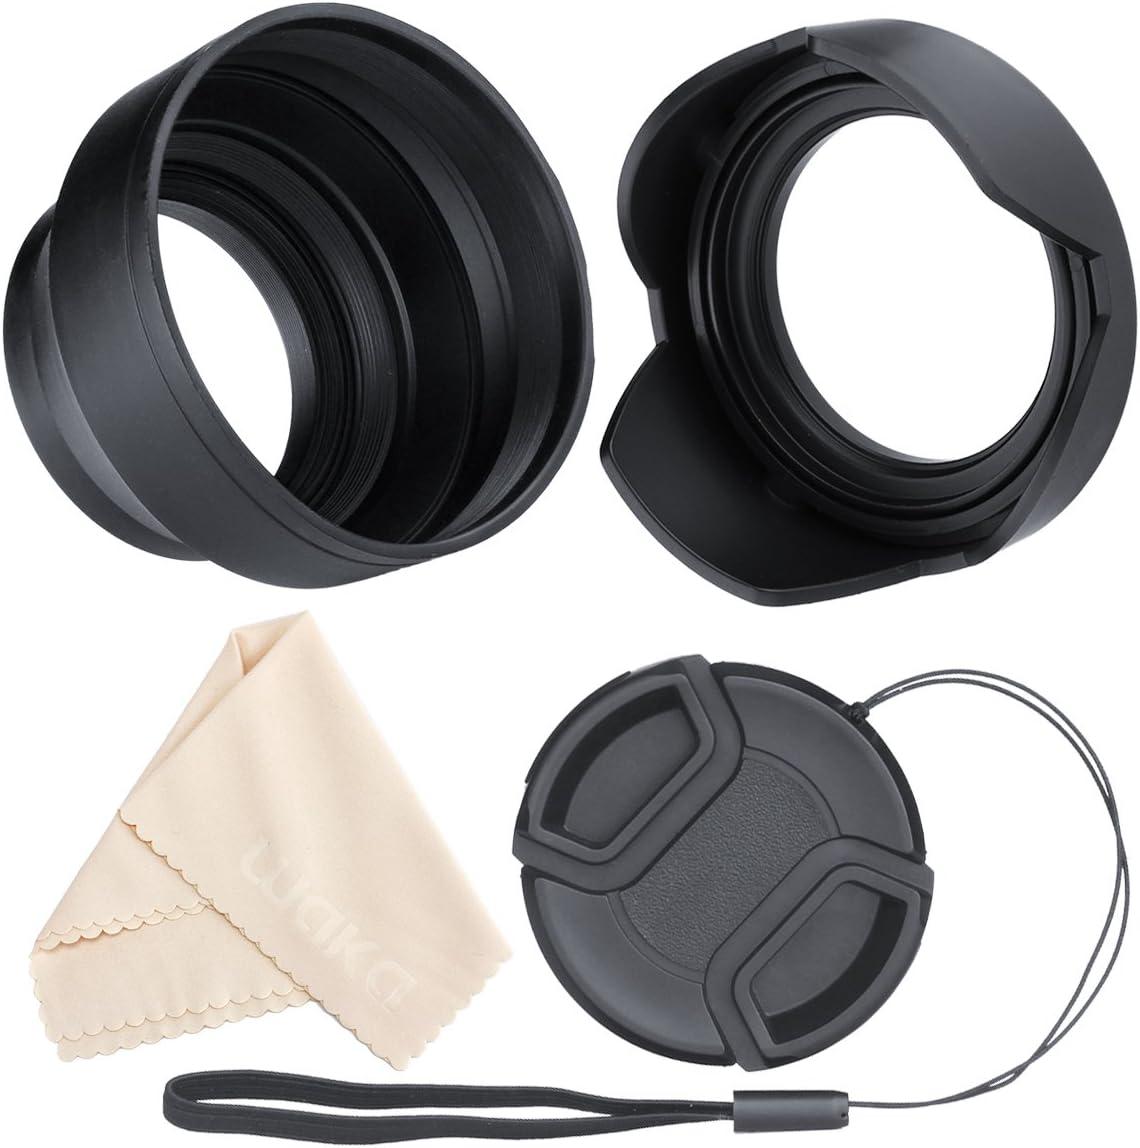 Microfiber Cleaning Cloth. 55mm + Lens Cap Holder Nikon D3500 Lens Cap Center Pinch